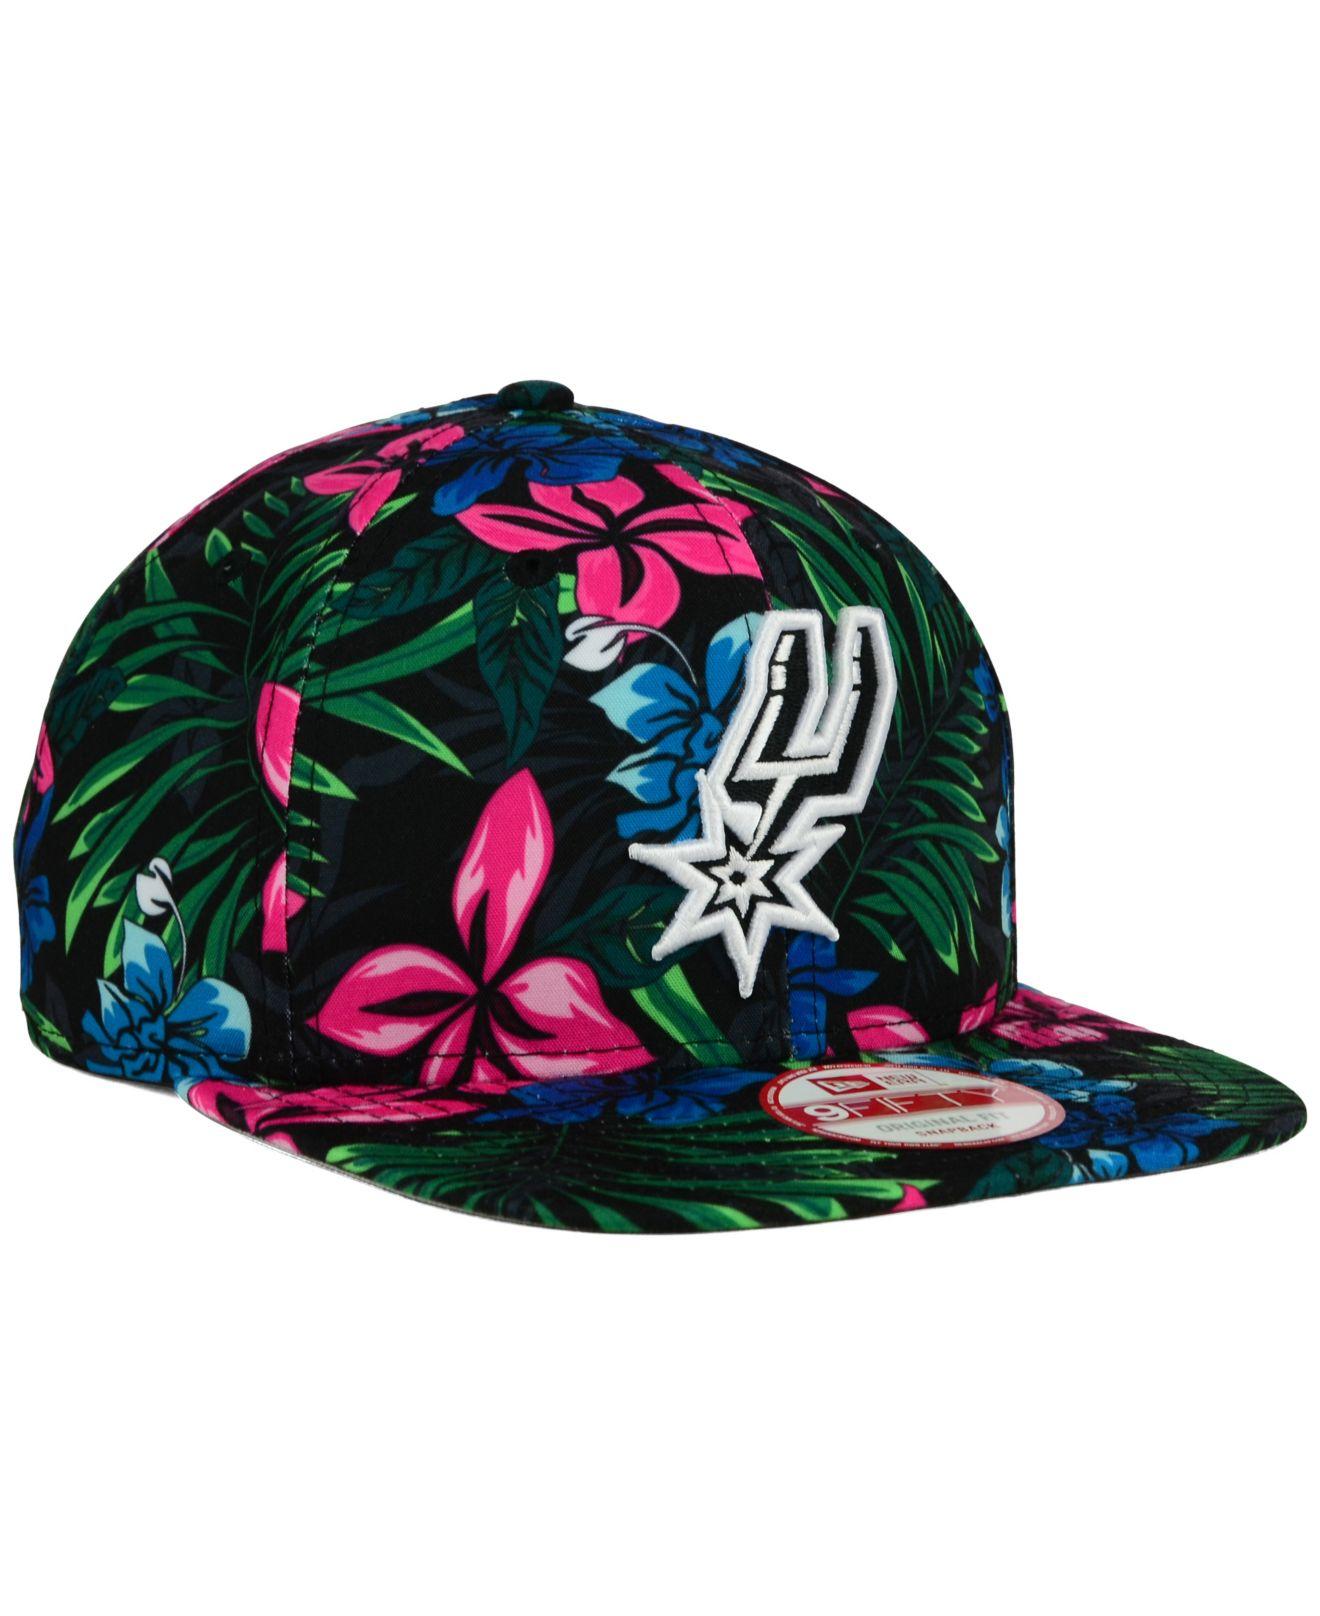 Lyst - KTZ San Antonio Spurs Hwc Shadow Floral 9fifty Snapback Cap ... bec1b5e66570